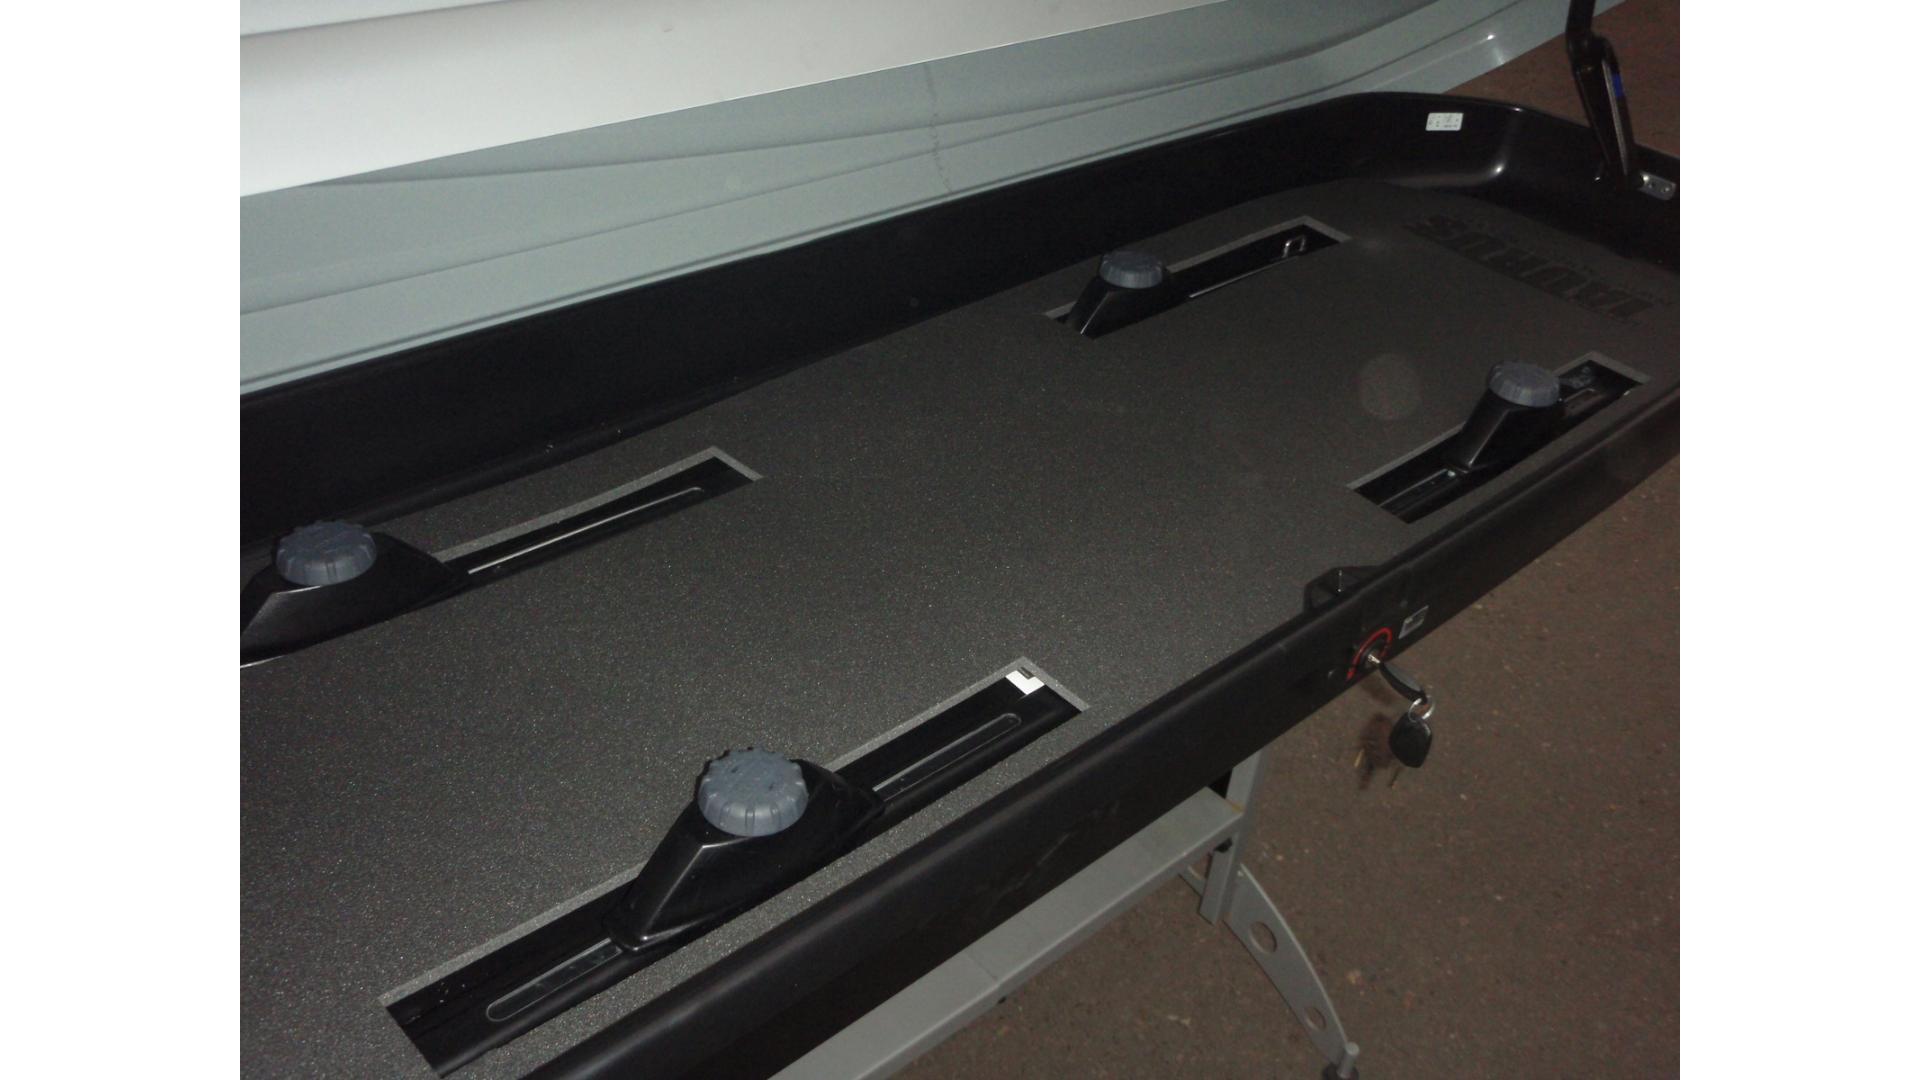 Taurus ochranní vložka do boxu A 780 (173x65 cm)